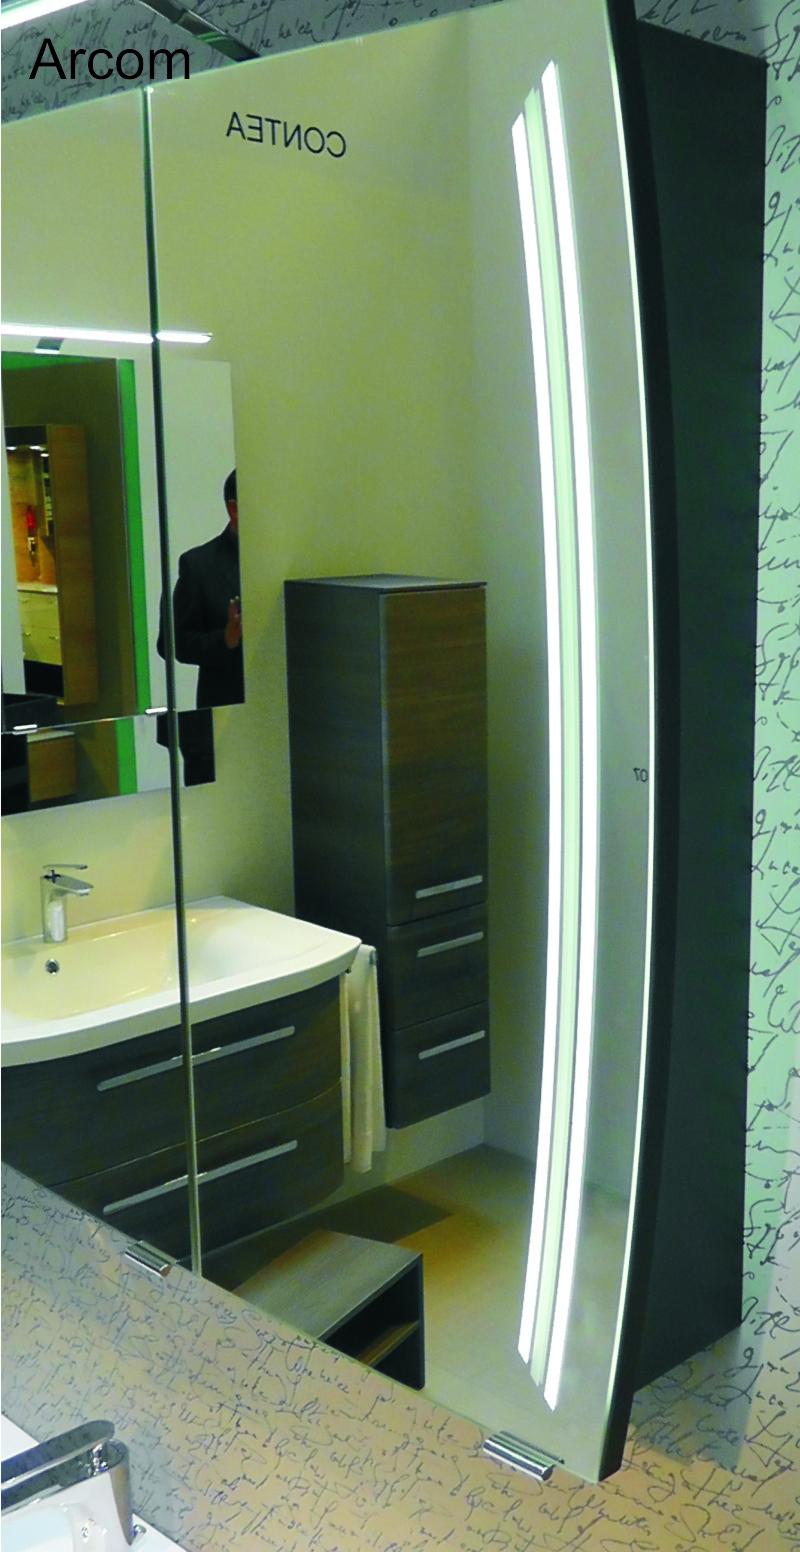 spiegelschank pelipal contea arcom center. Black Bedroom Furniture Sets. Home Design Ideas